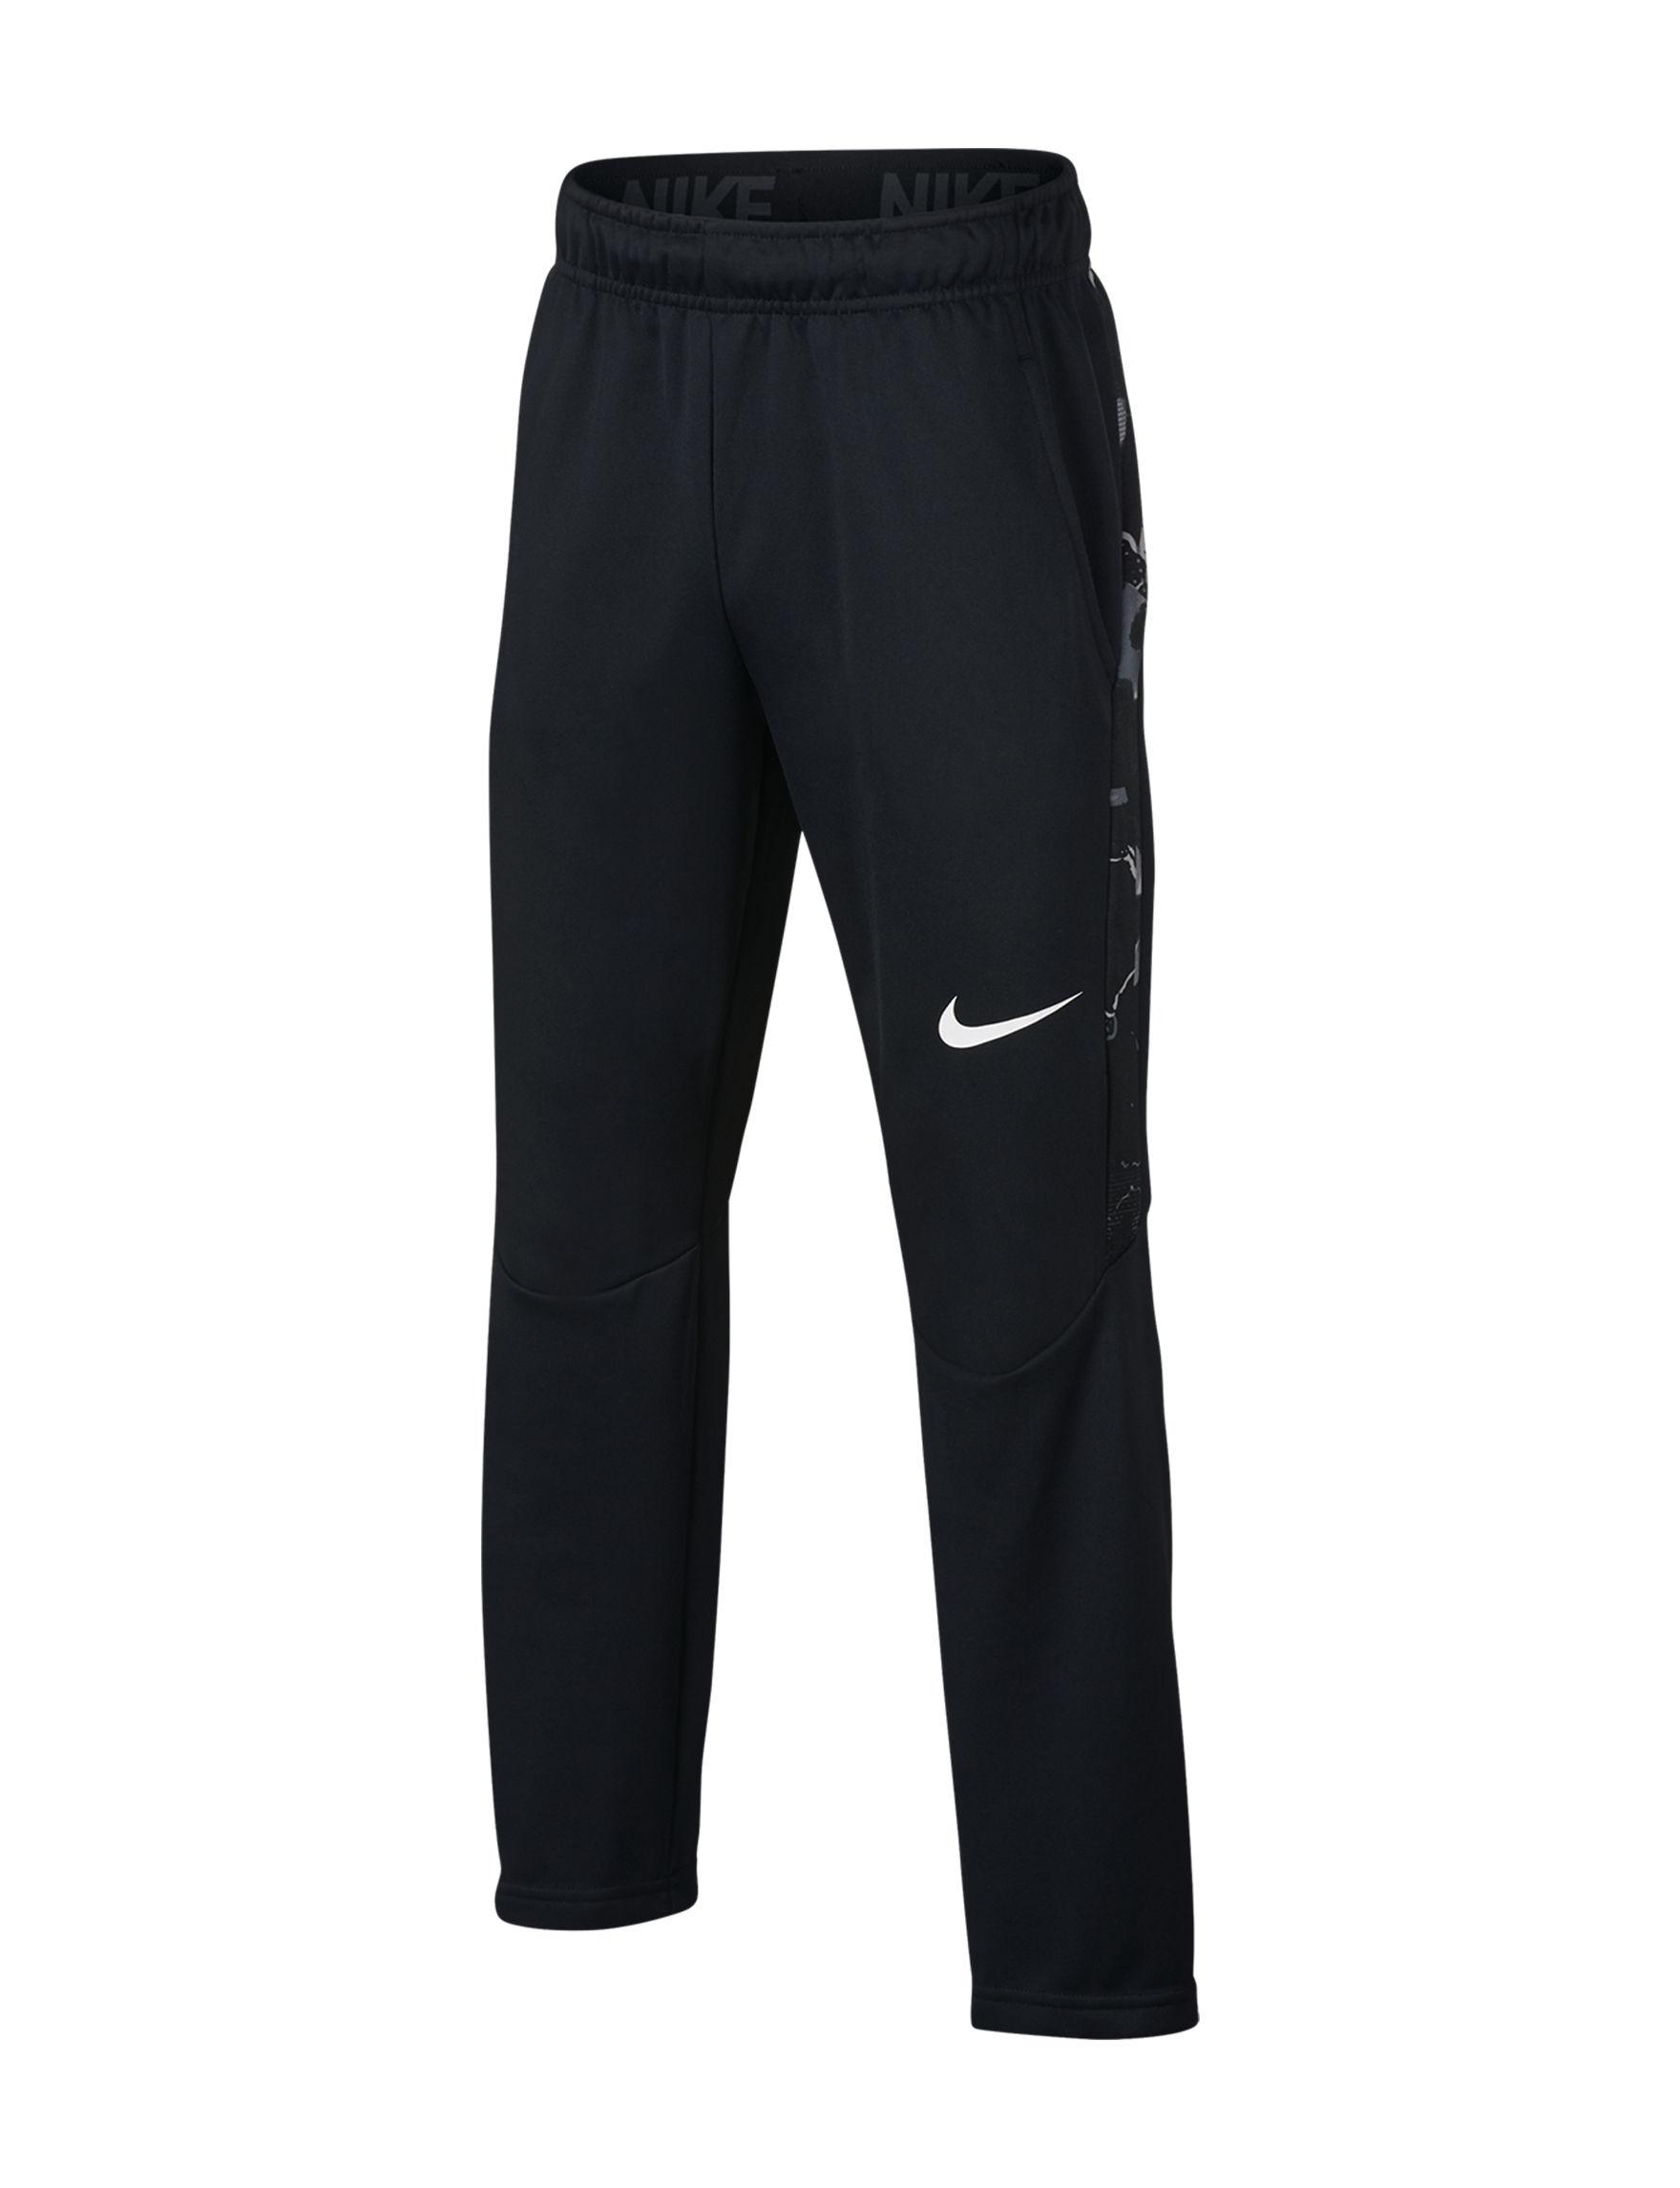 Nike Black Soft Pants